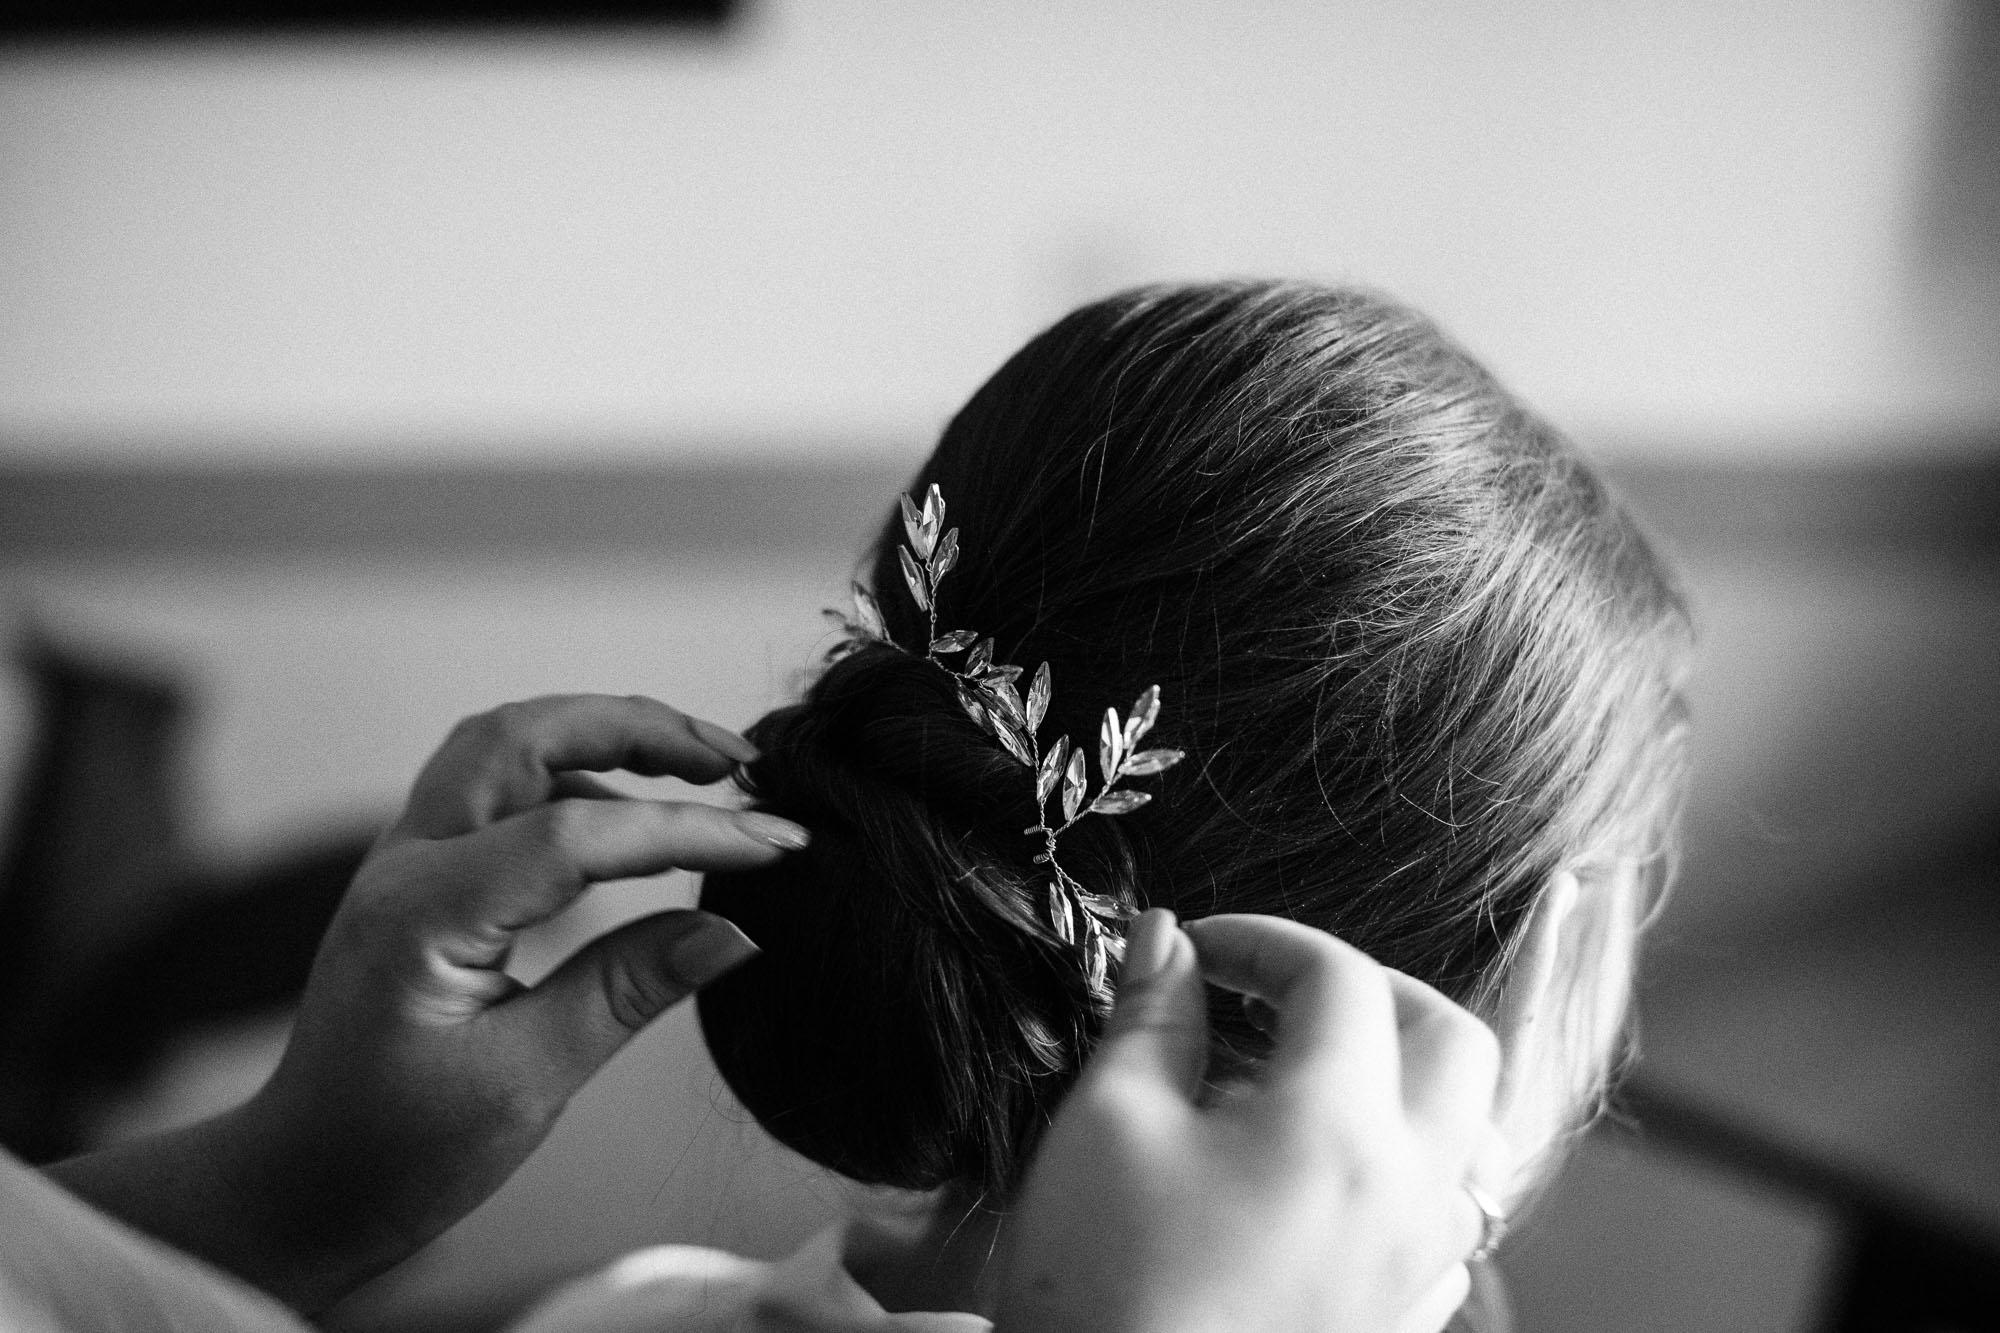 rolling-pines-berwick-pa-wedding-6594.jpg